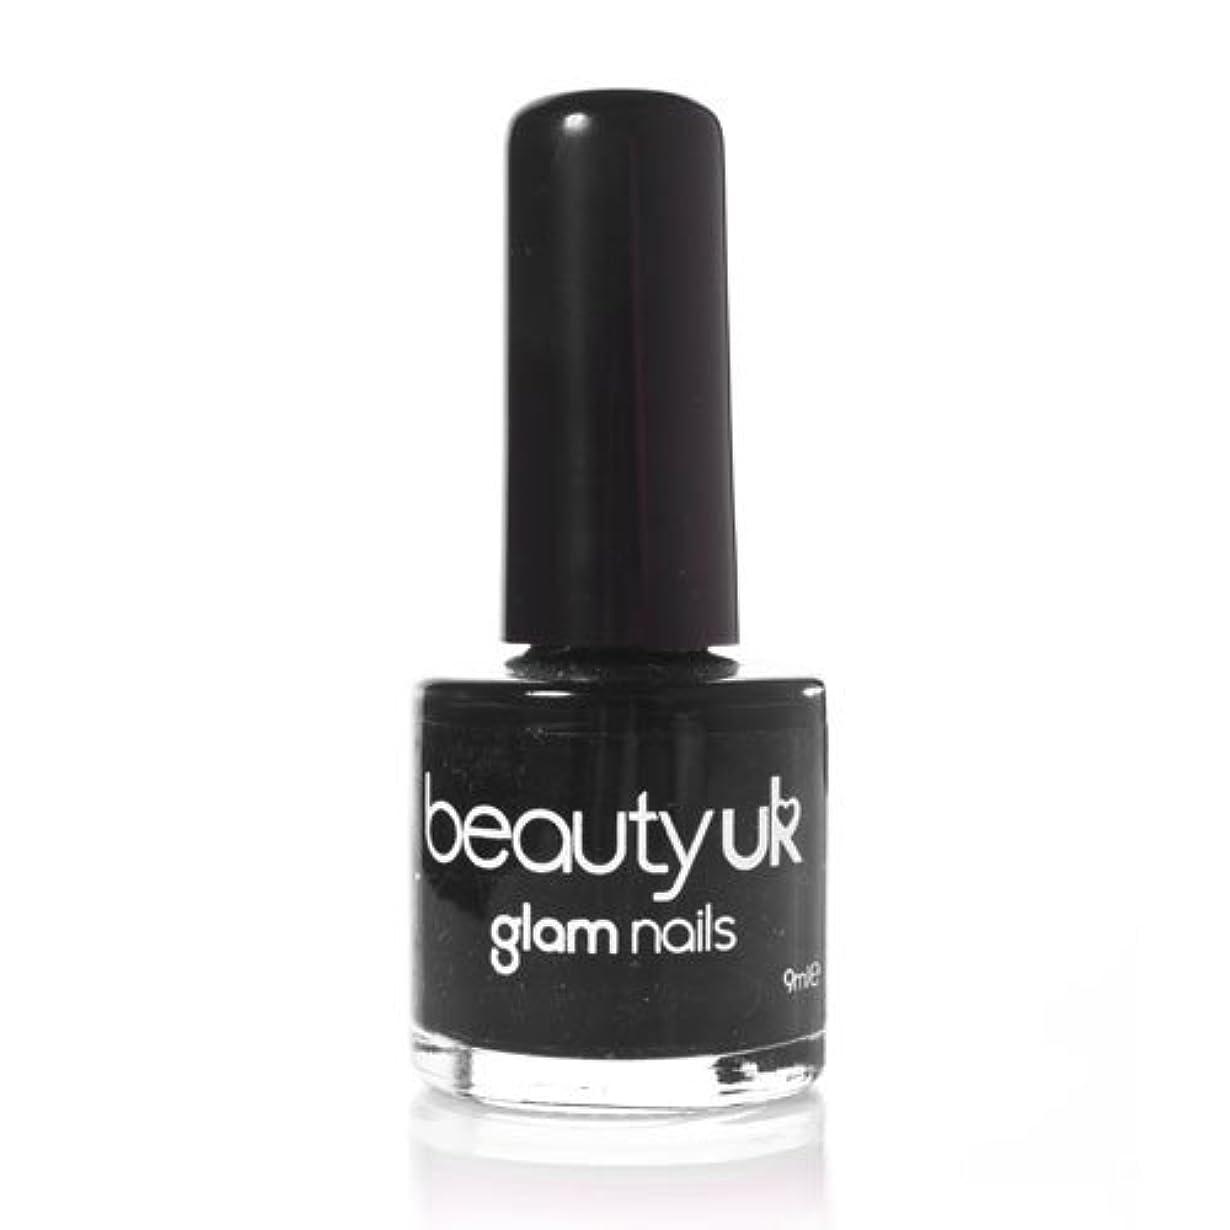 Beauty Uk Glam Nails No6 Black 9ml [並行輸入品]